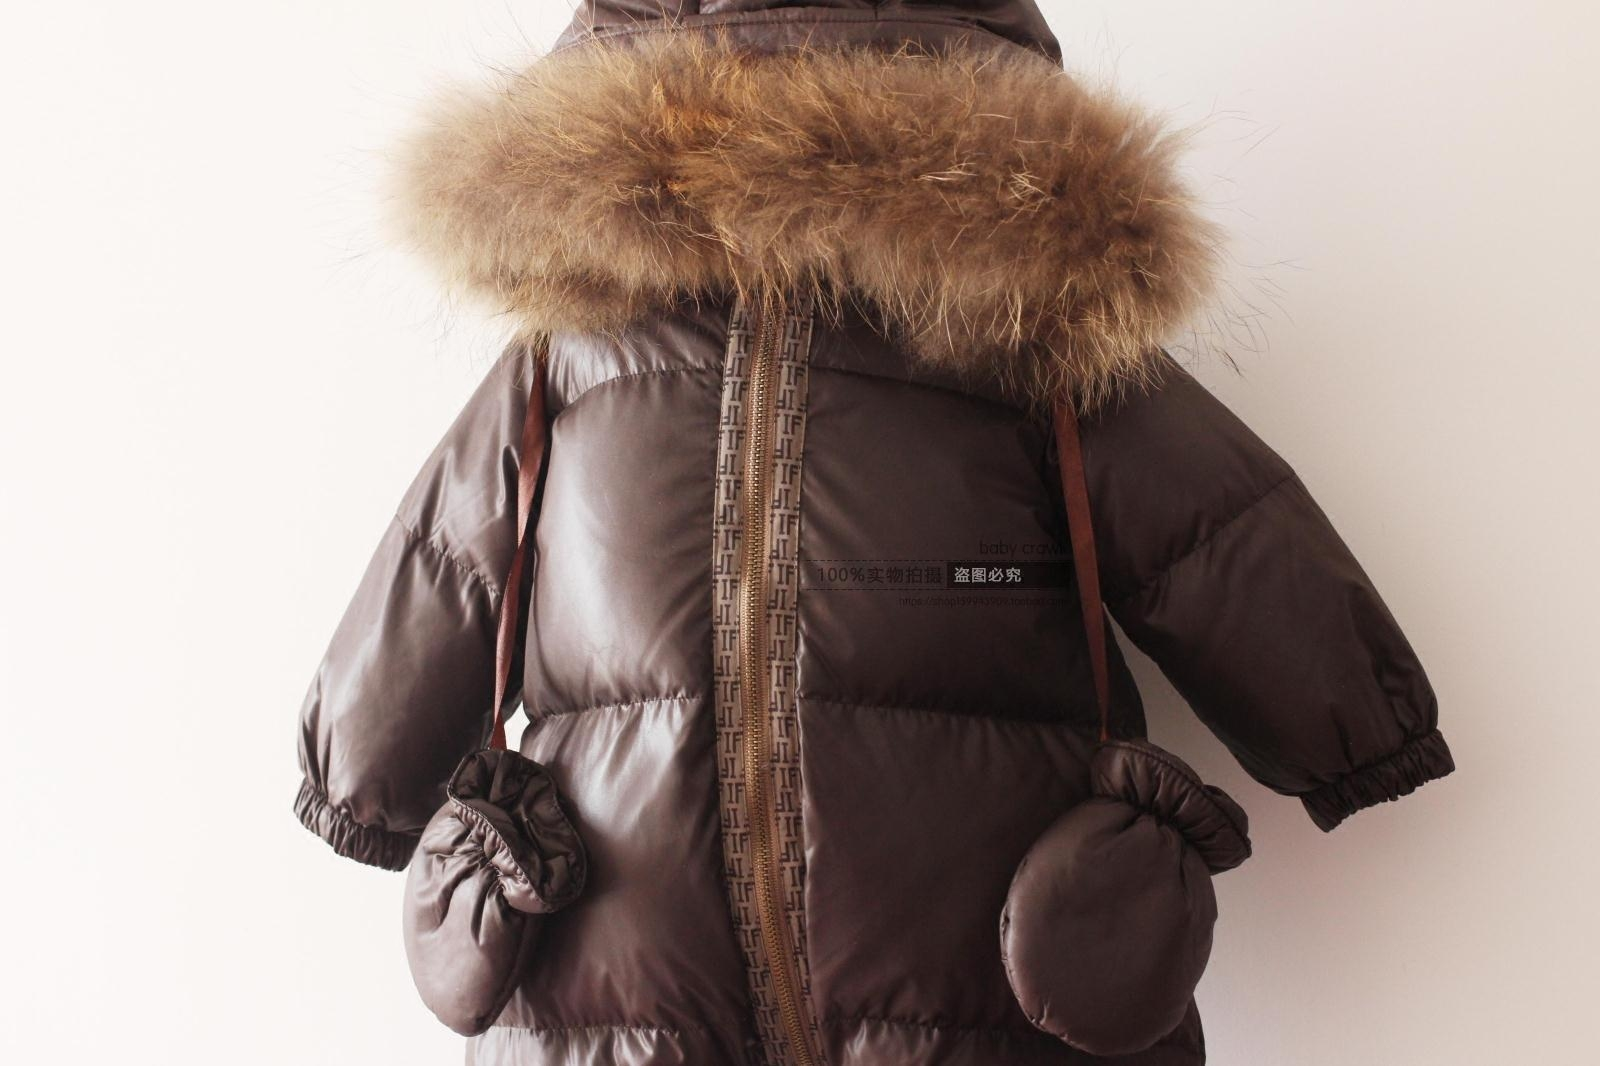 df424b2e02d4 2017 Fashion Winter Newborn Winter Jackets for Baby Girls Down Coats ...